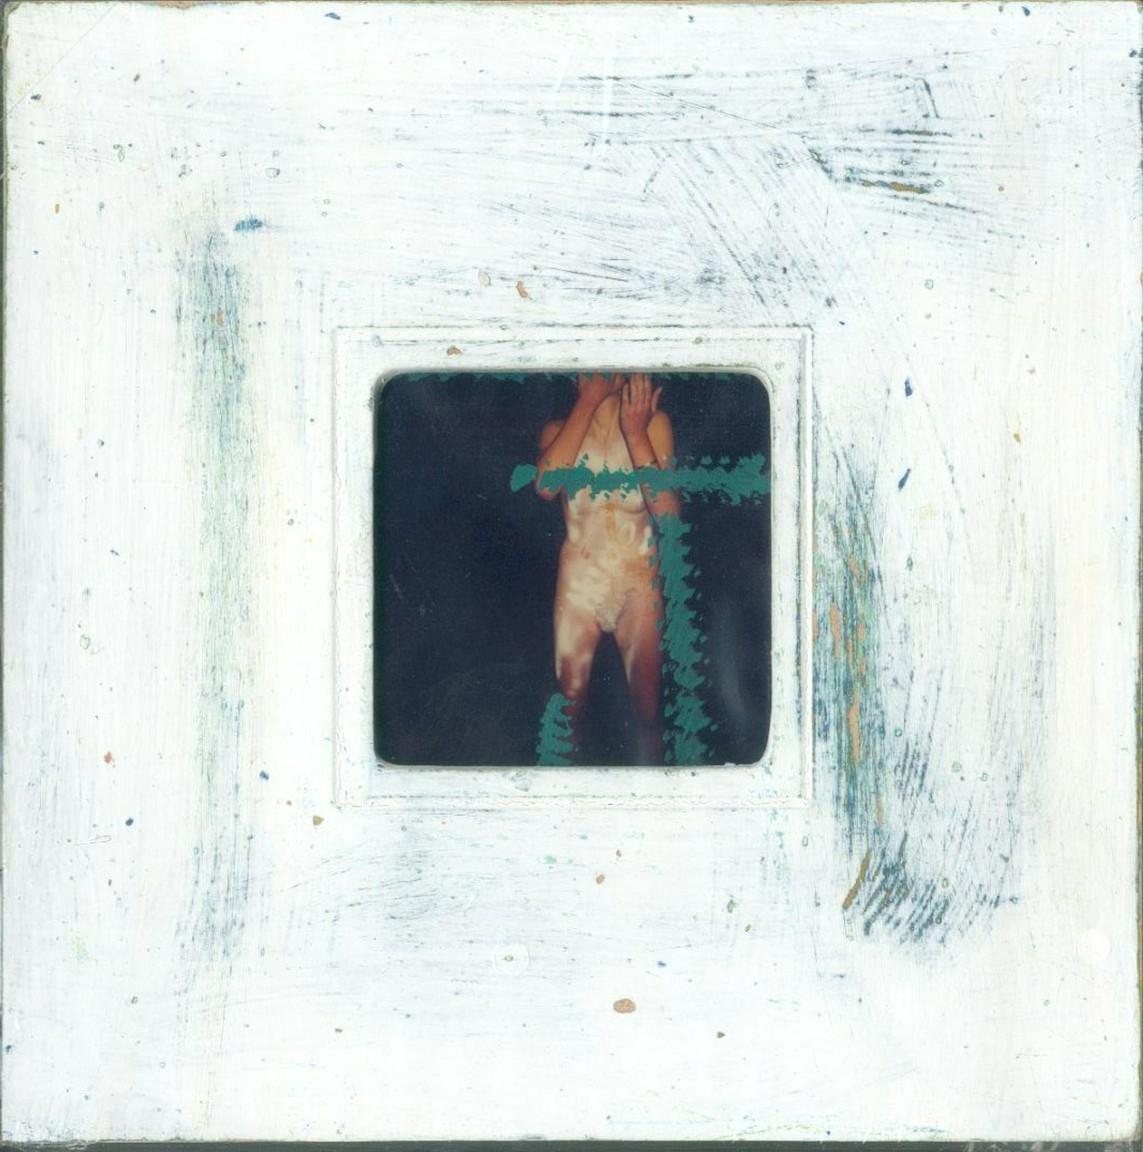 »lebegut12«, Polaroid, Mixed Media, aus der Serie 'Lebe gut, werde Künstler', 2000